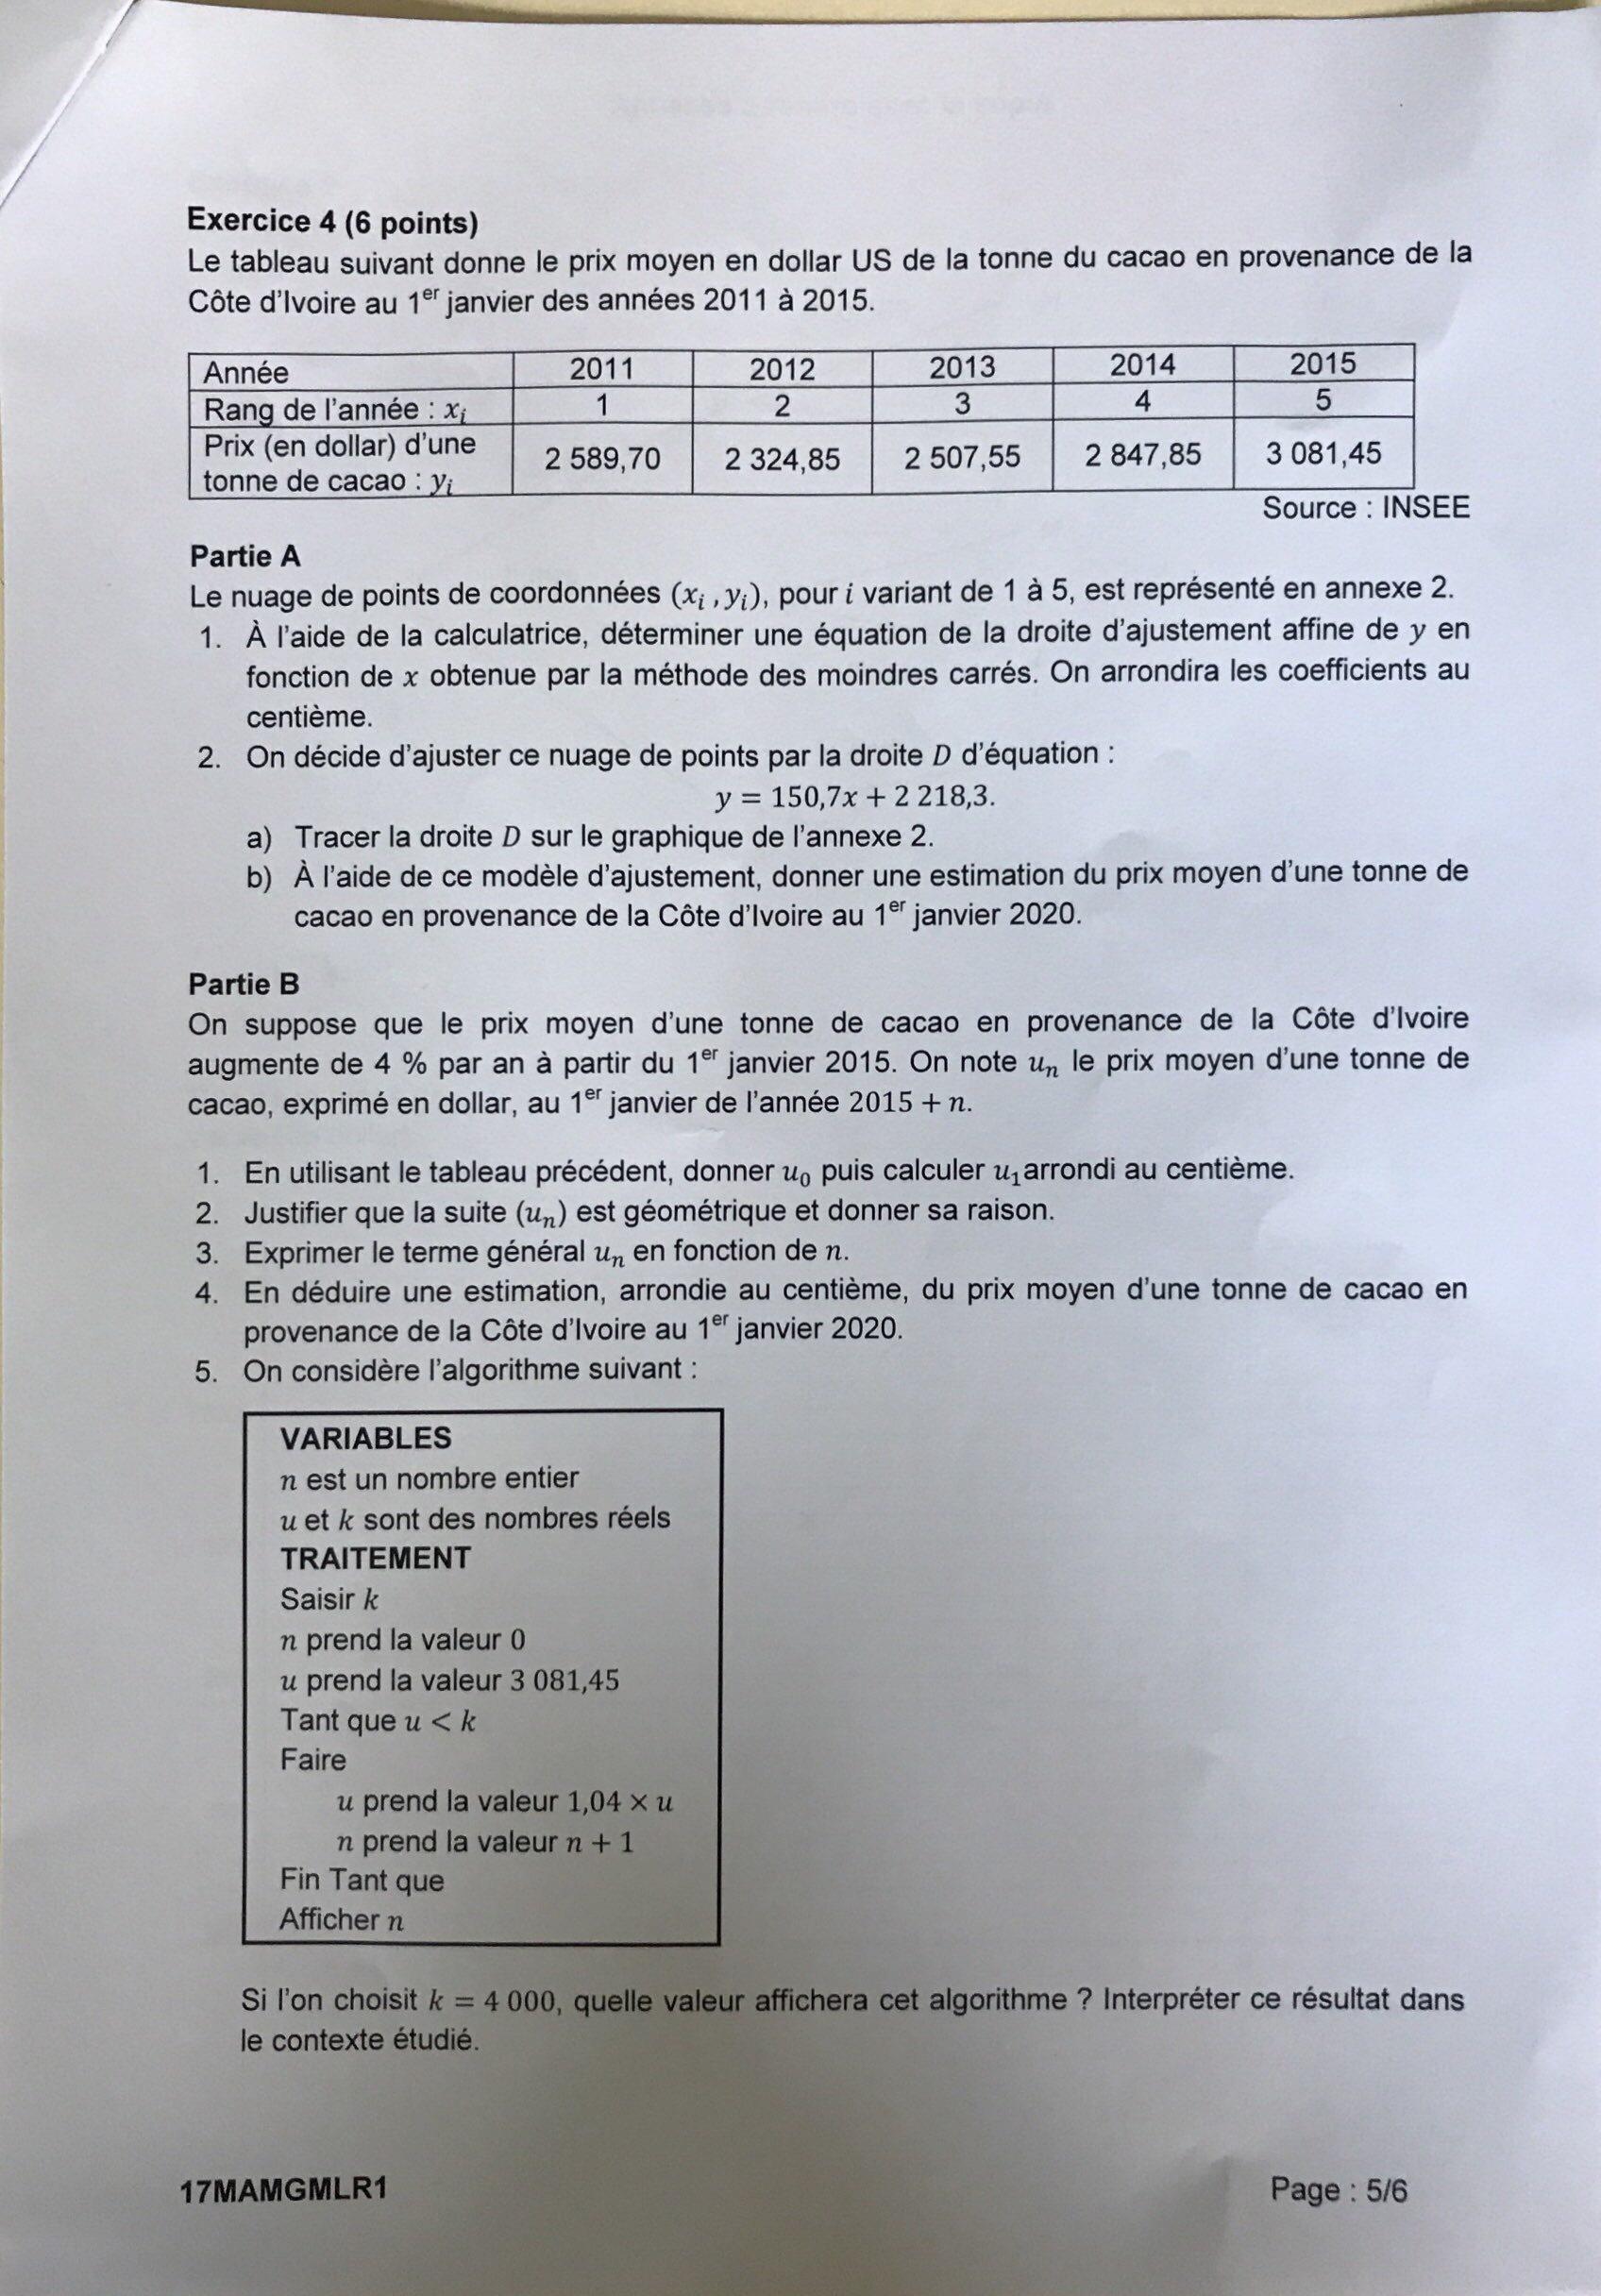 exercice-4-maths-stmg-bac-2017